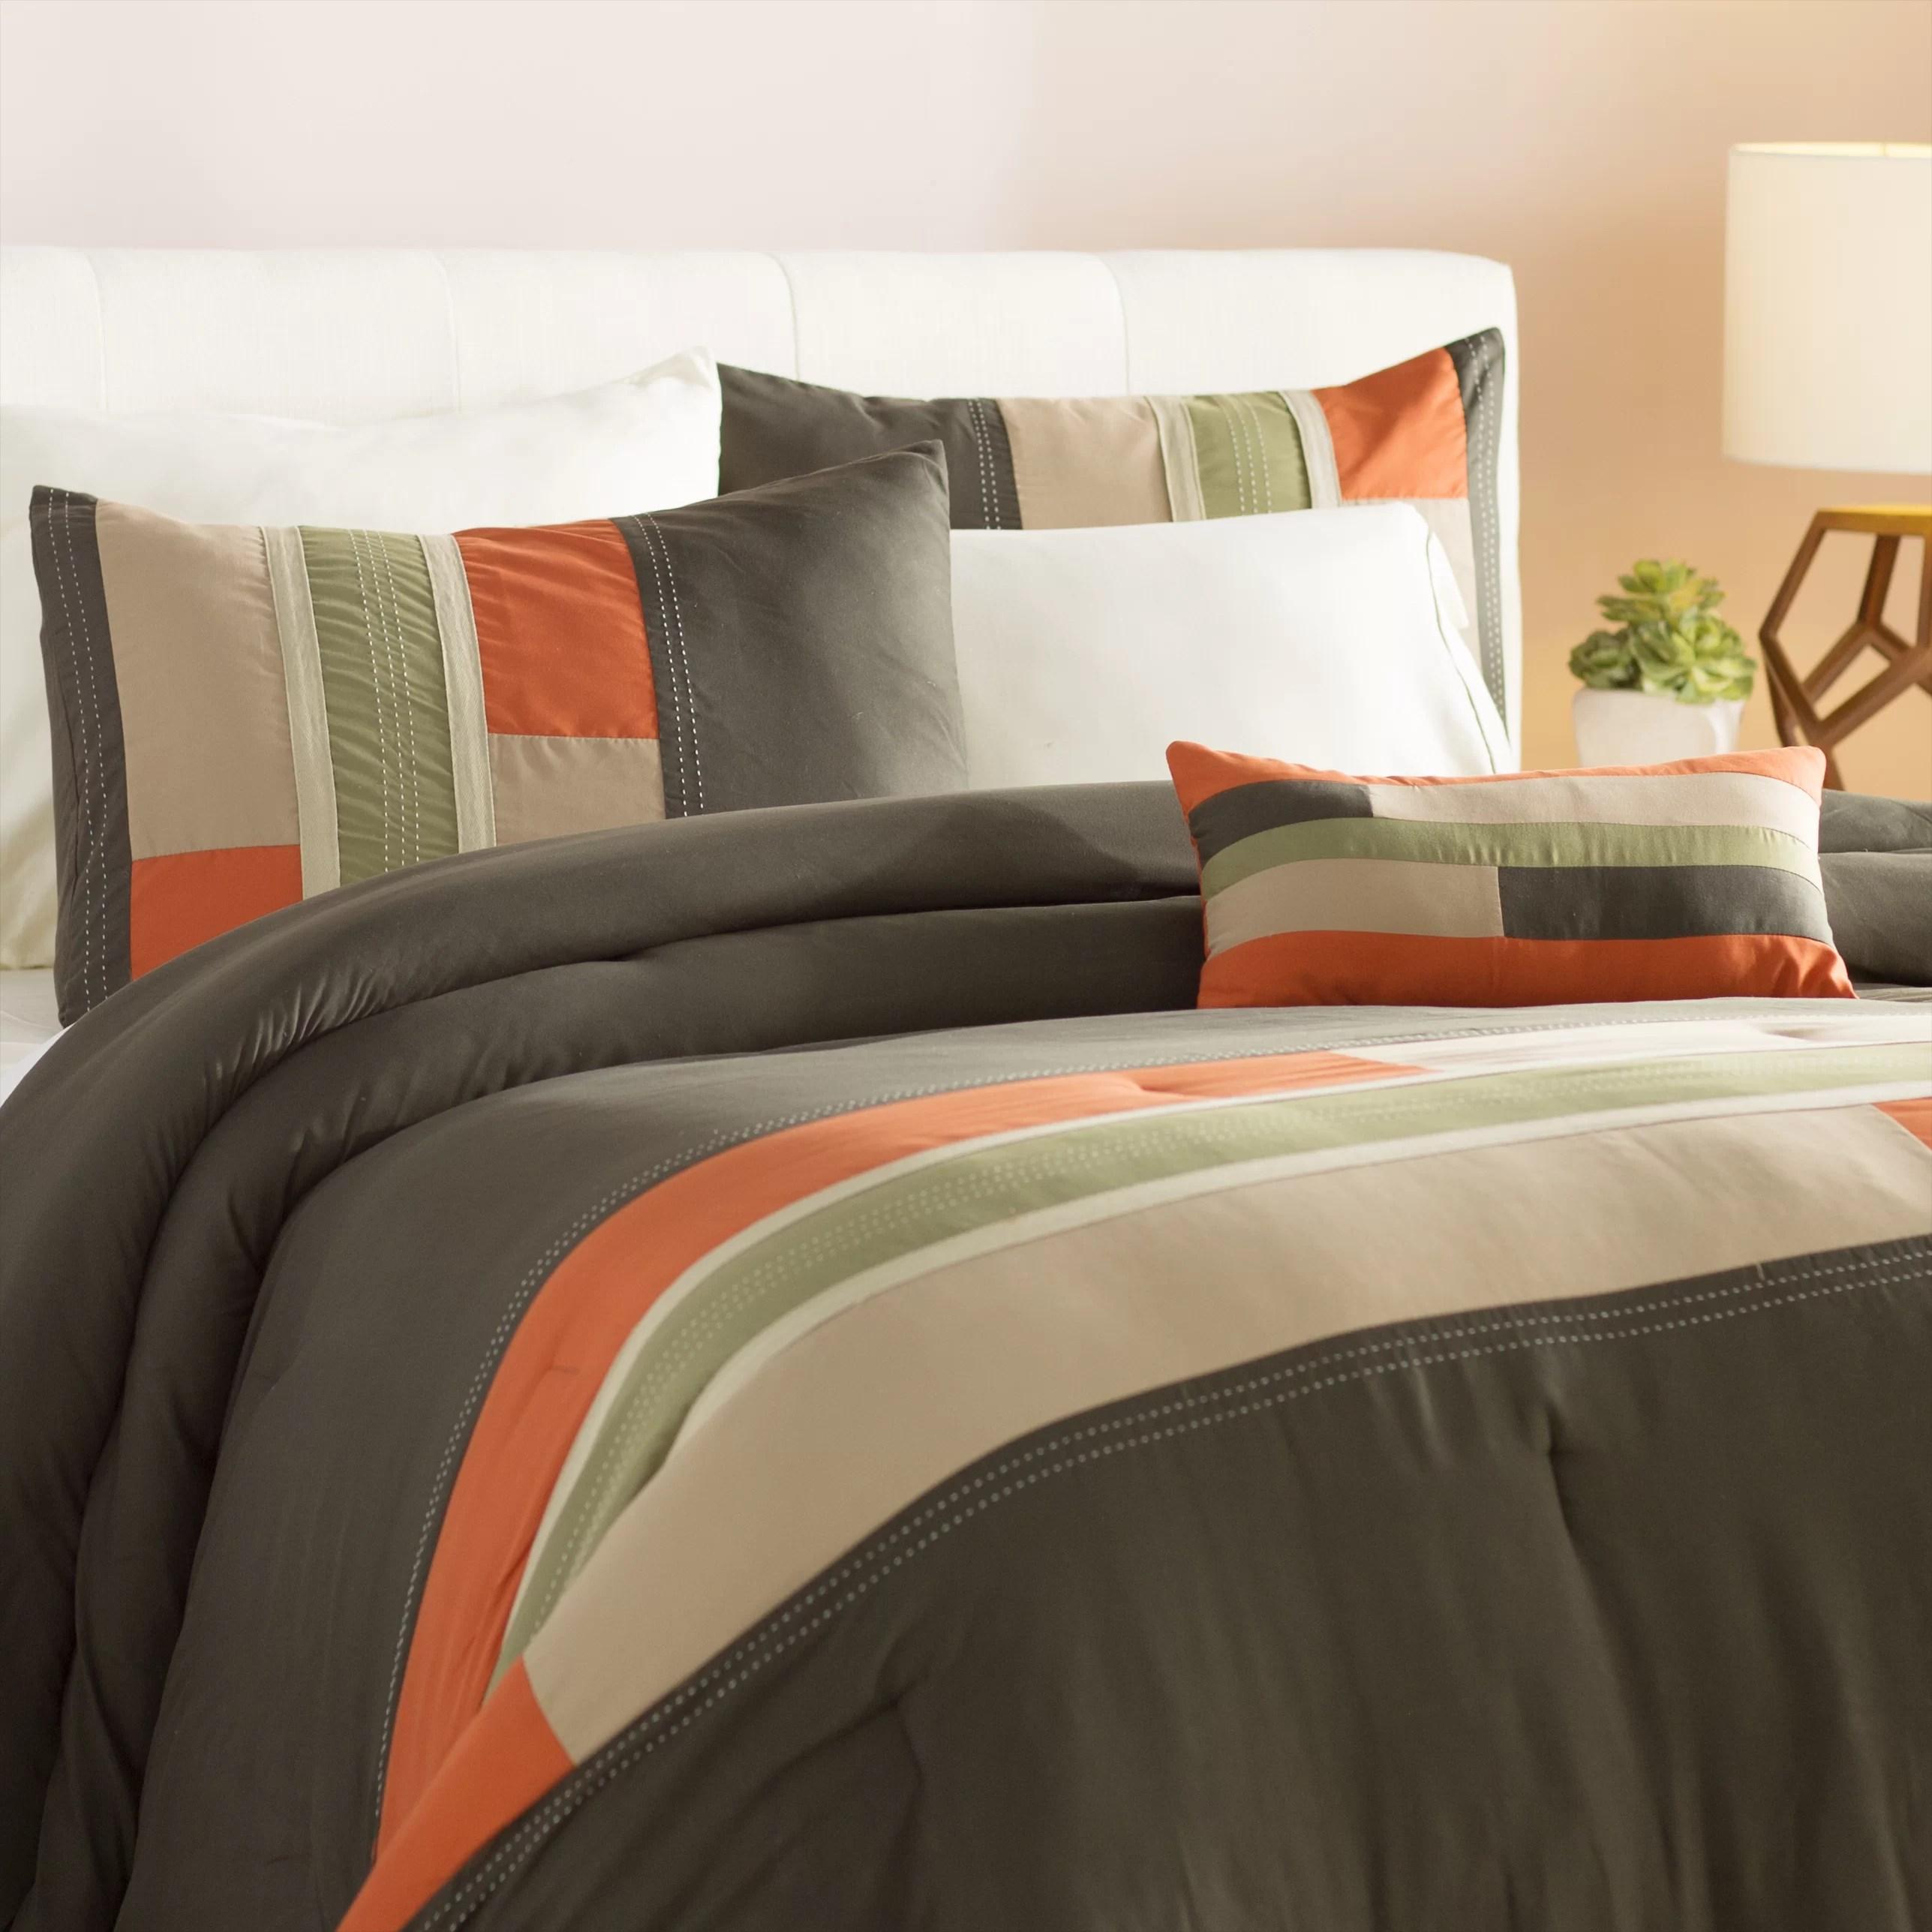 black comforter bedding you ll love in